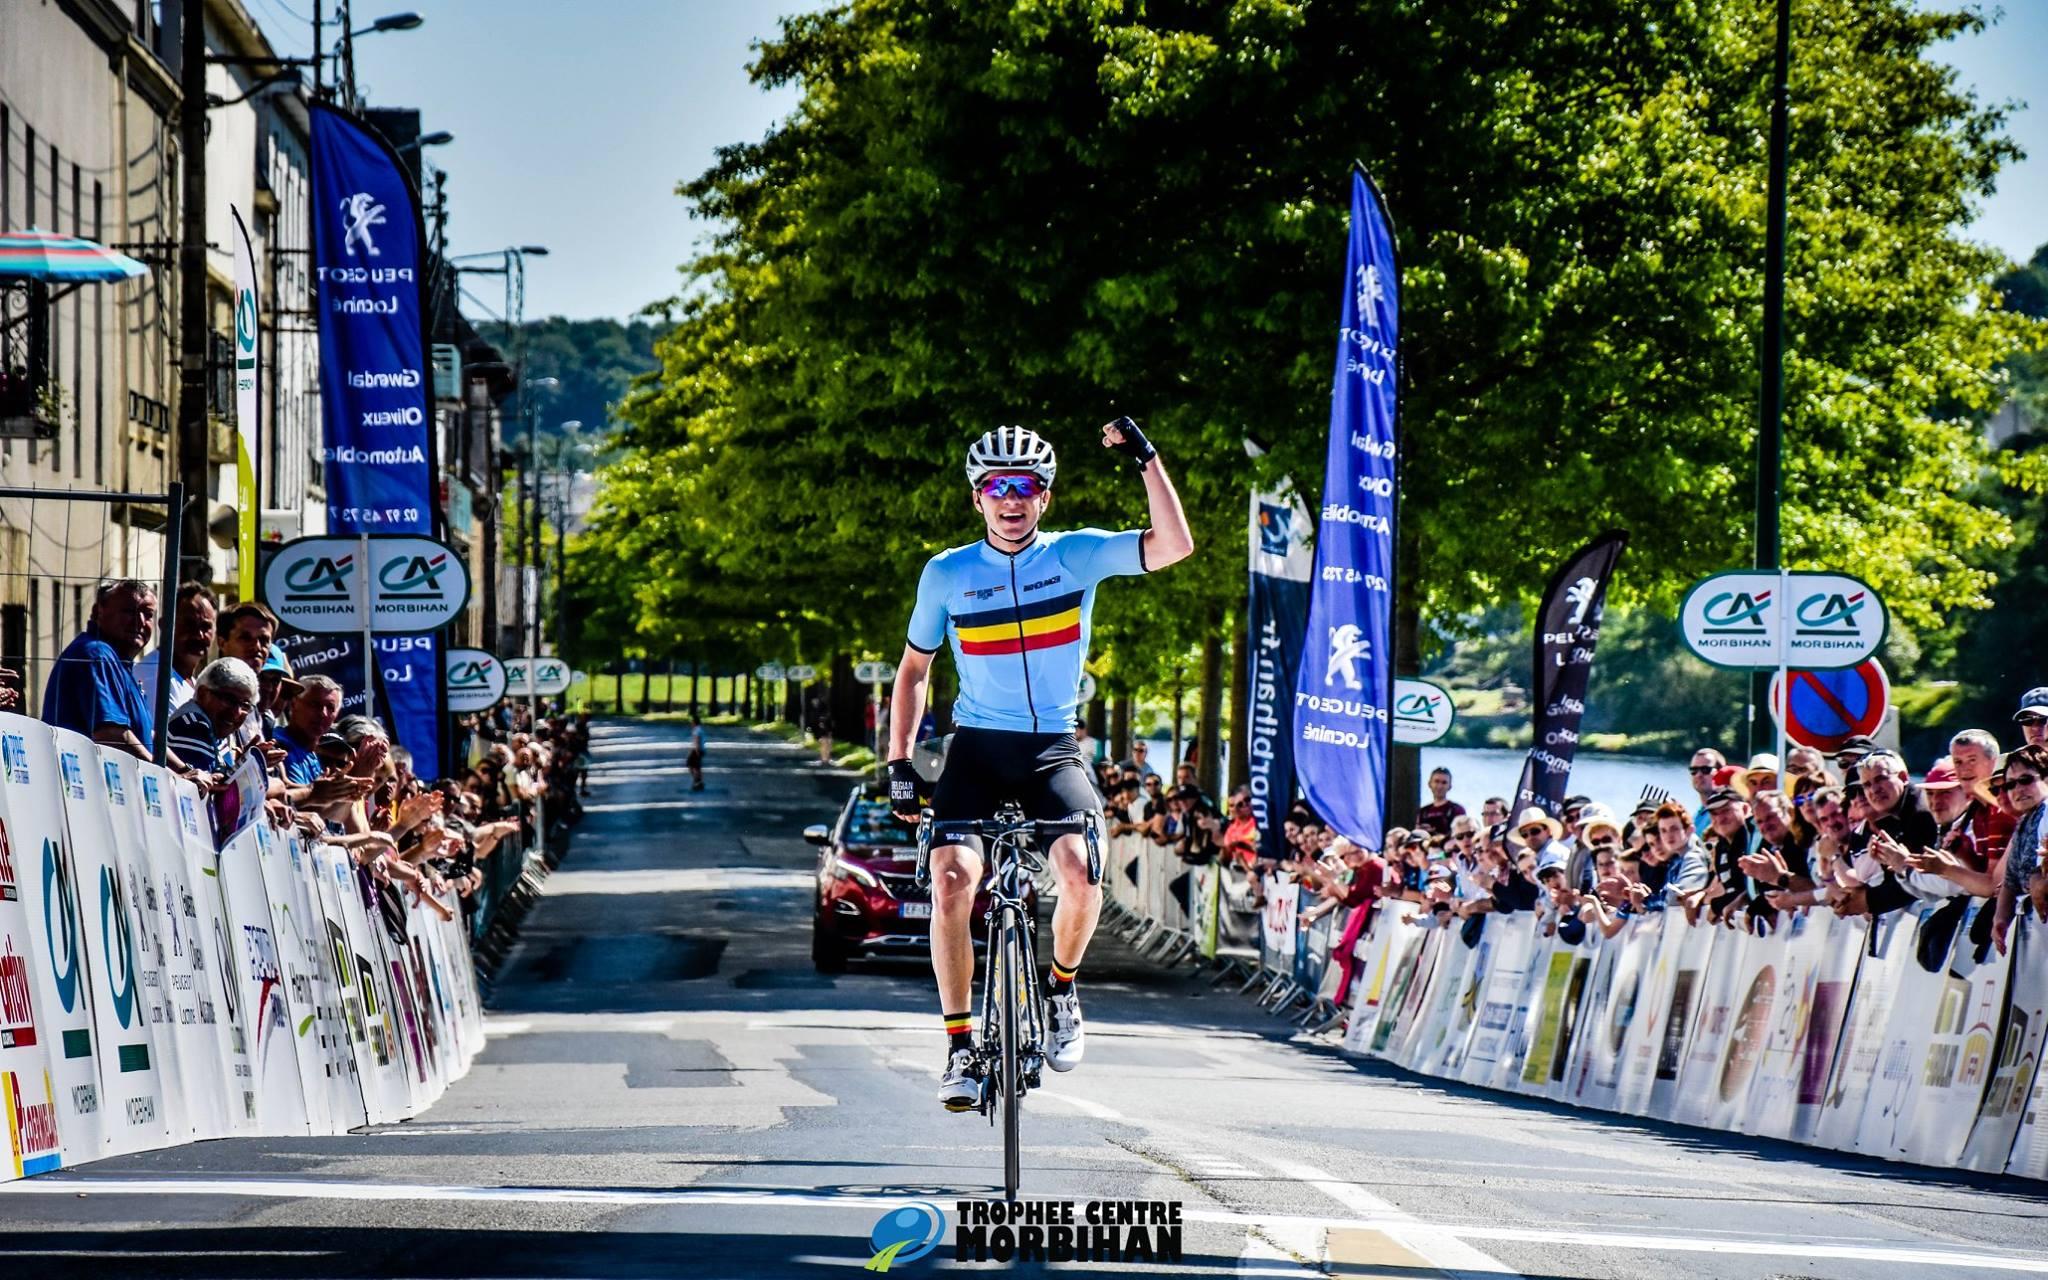 Remco Evenepoel vince la prima tappa delTrophée Centre Morbihan